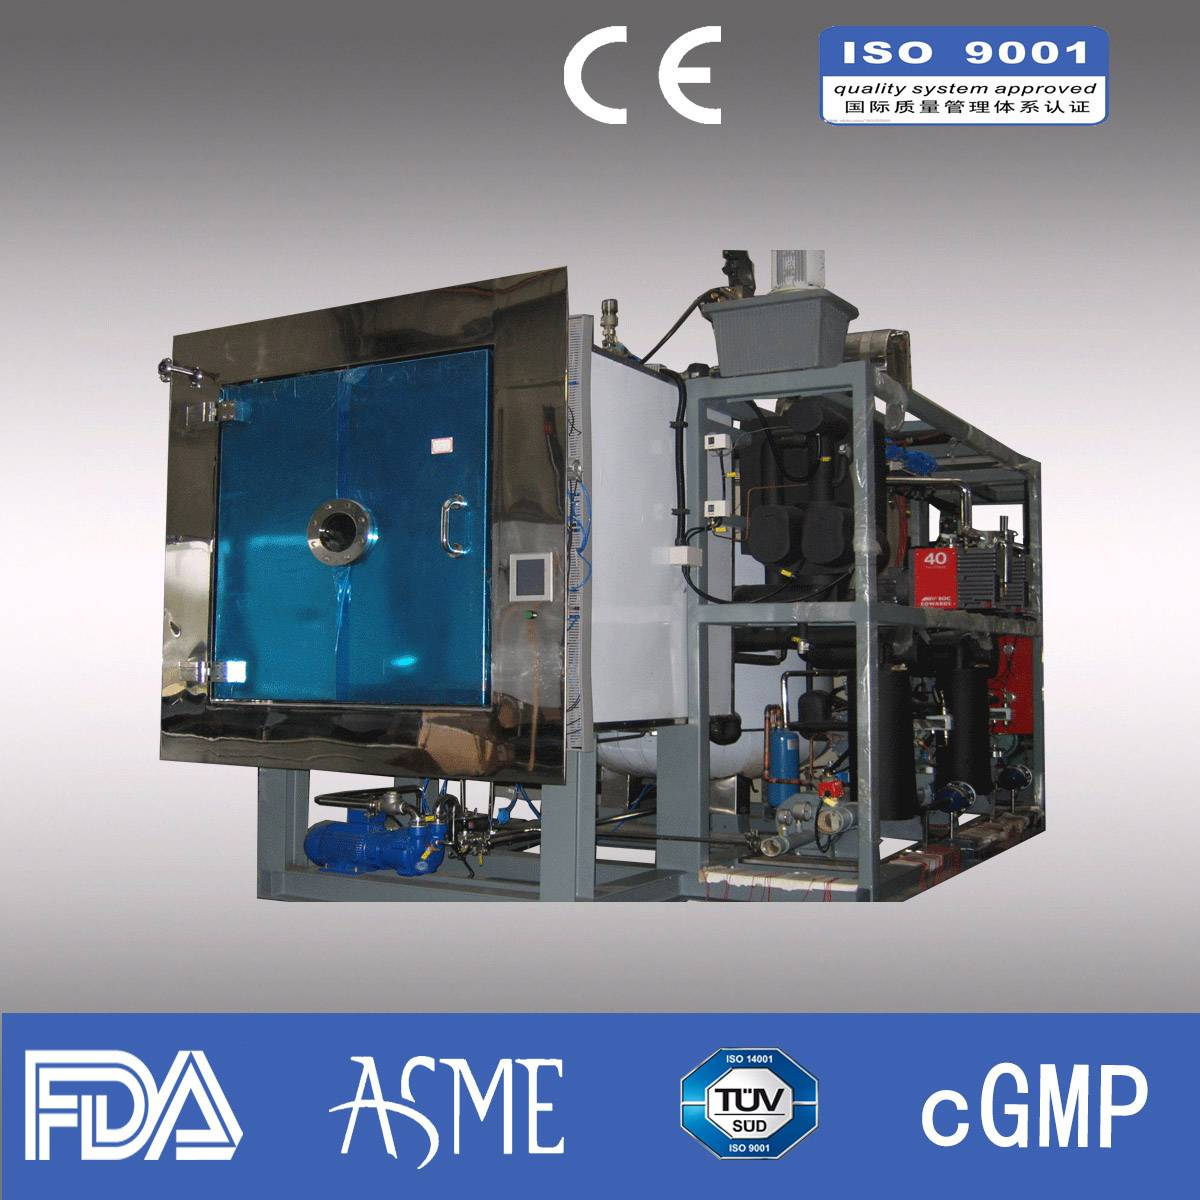 Freeze dryer/ Pharmaceutical freeze dryer/ industrial freeze dryer/Capacity 1000kg